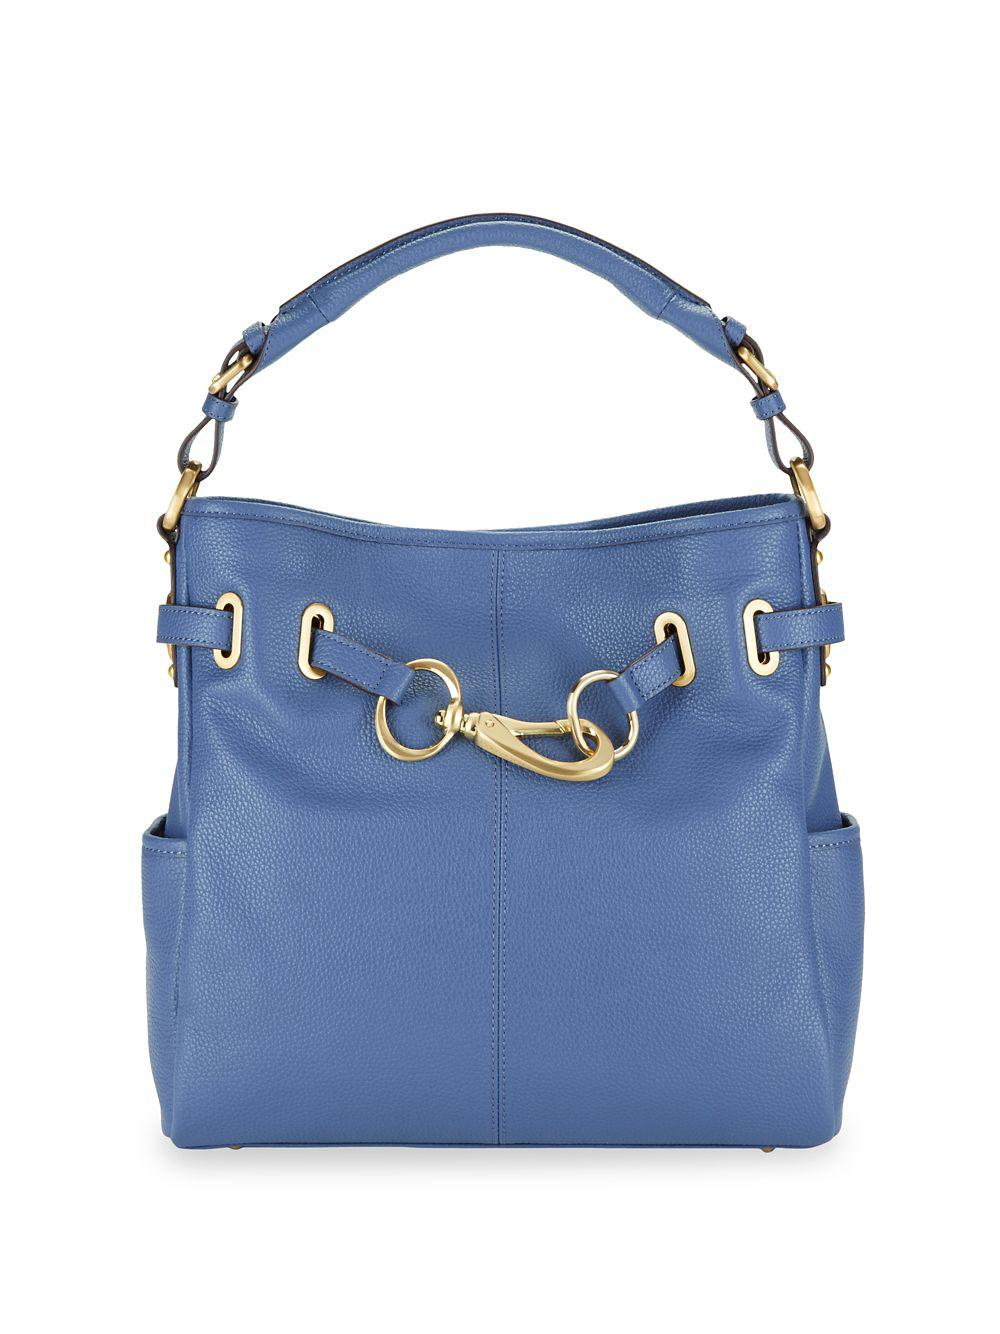 DKNY Sally Hobo (Black) Hobo Handbags xxKU5